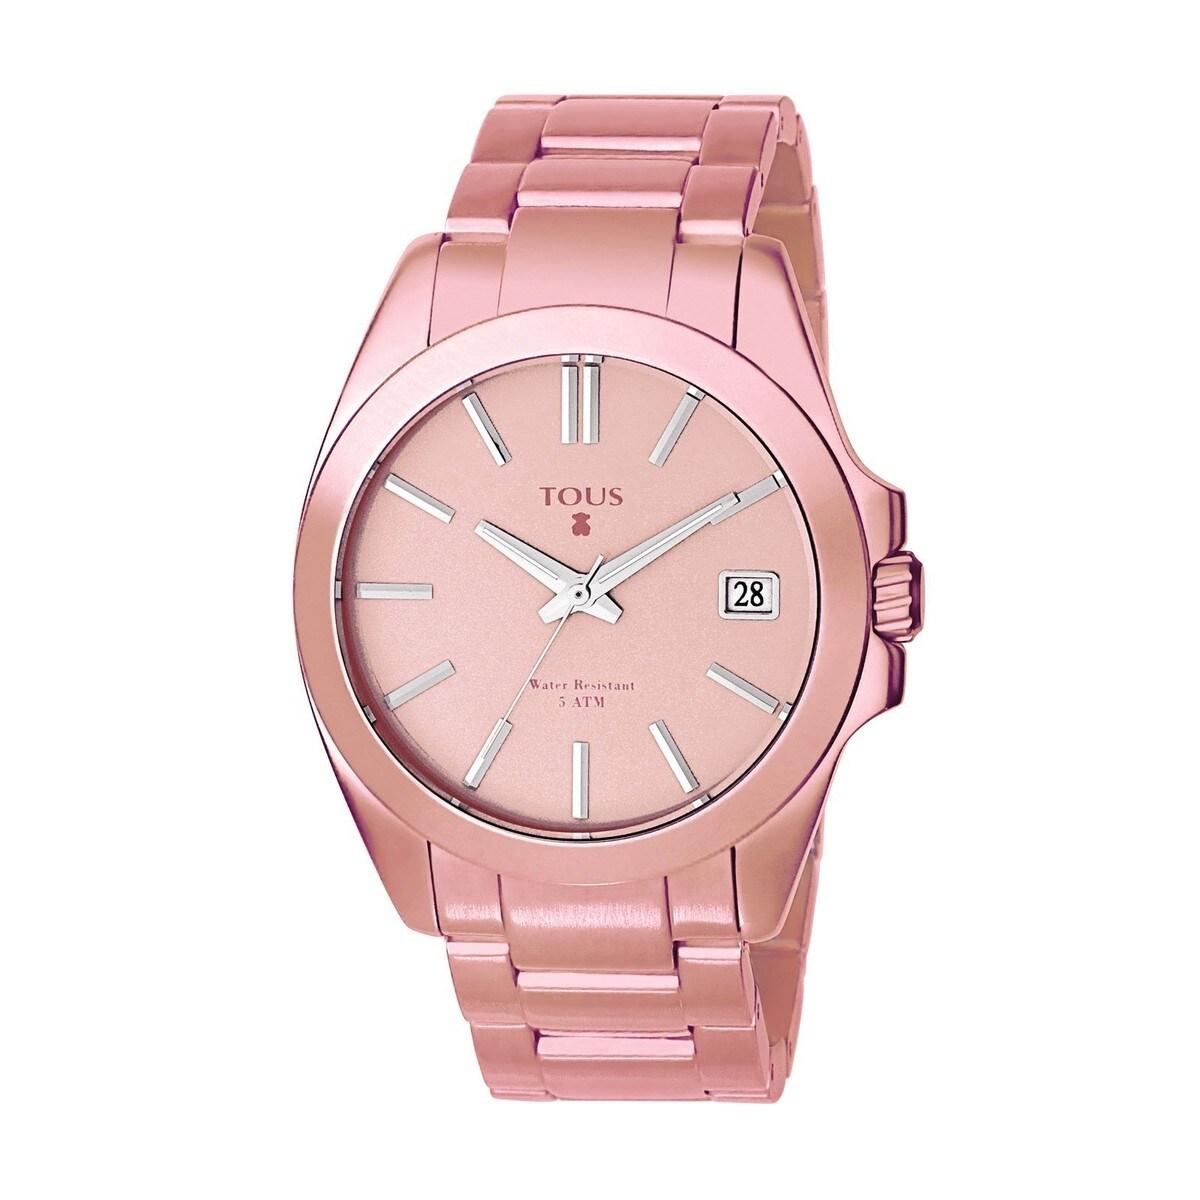 Reloj Drive Aluminio anoditzat rosa